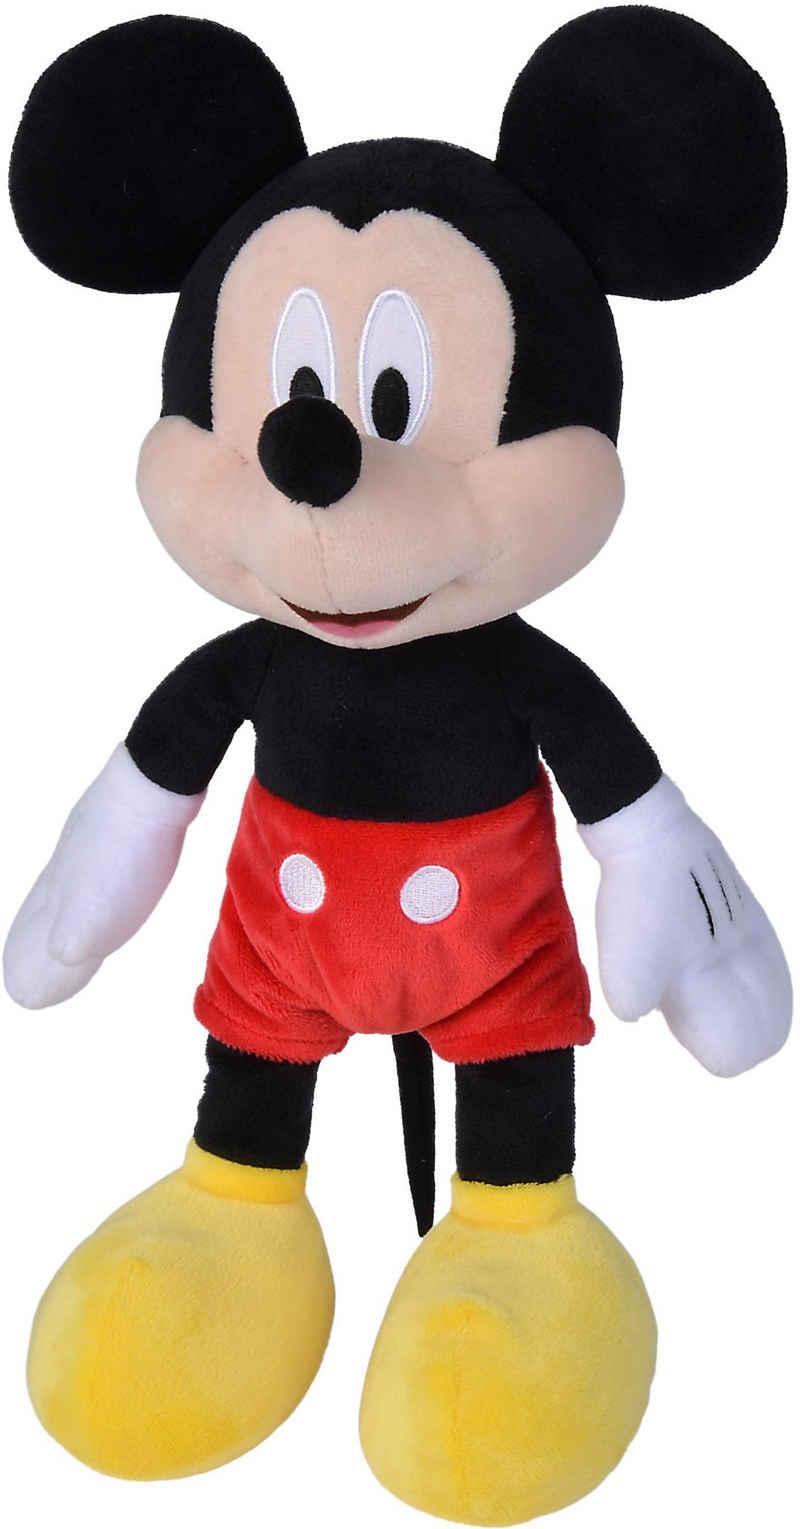 SIMBA Plüschfigur »Disney MM, Mickey, 35 cm«